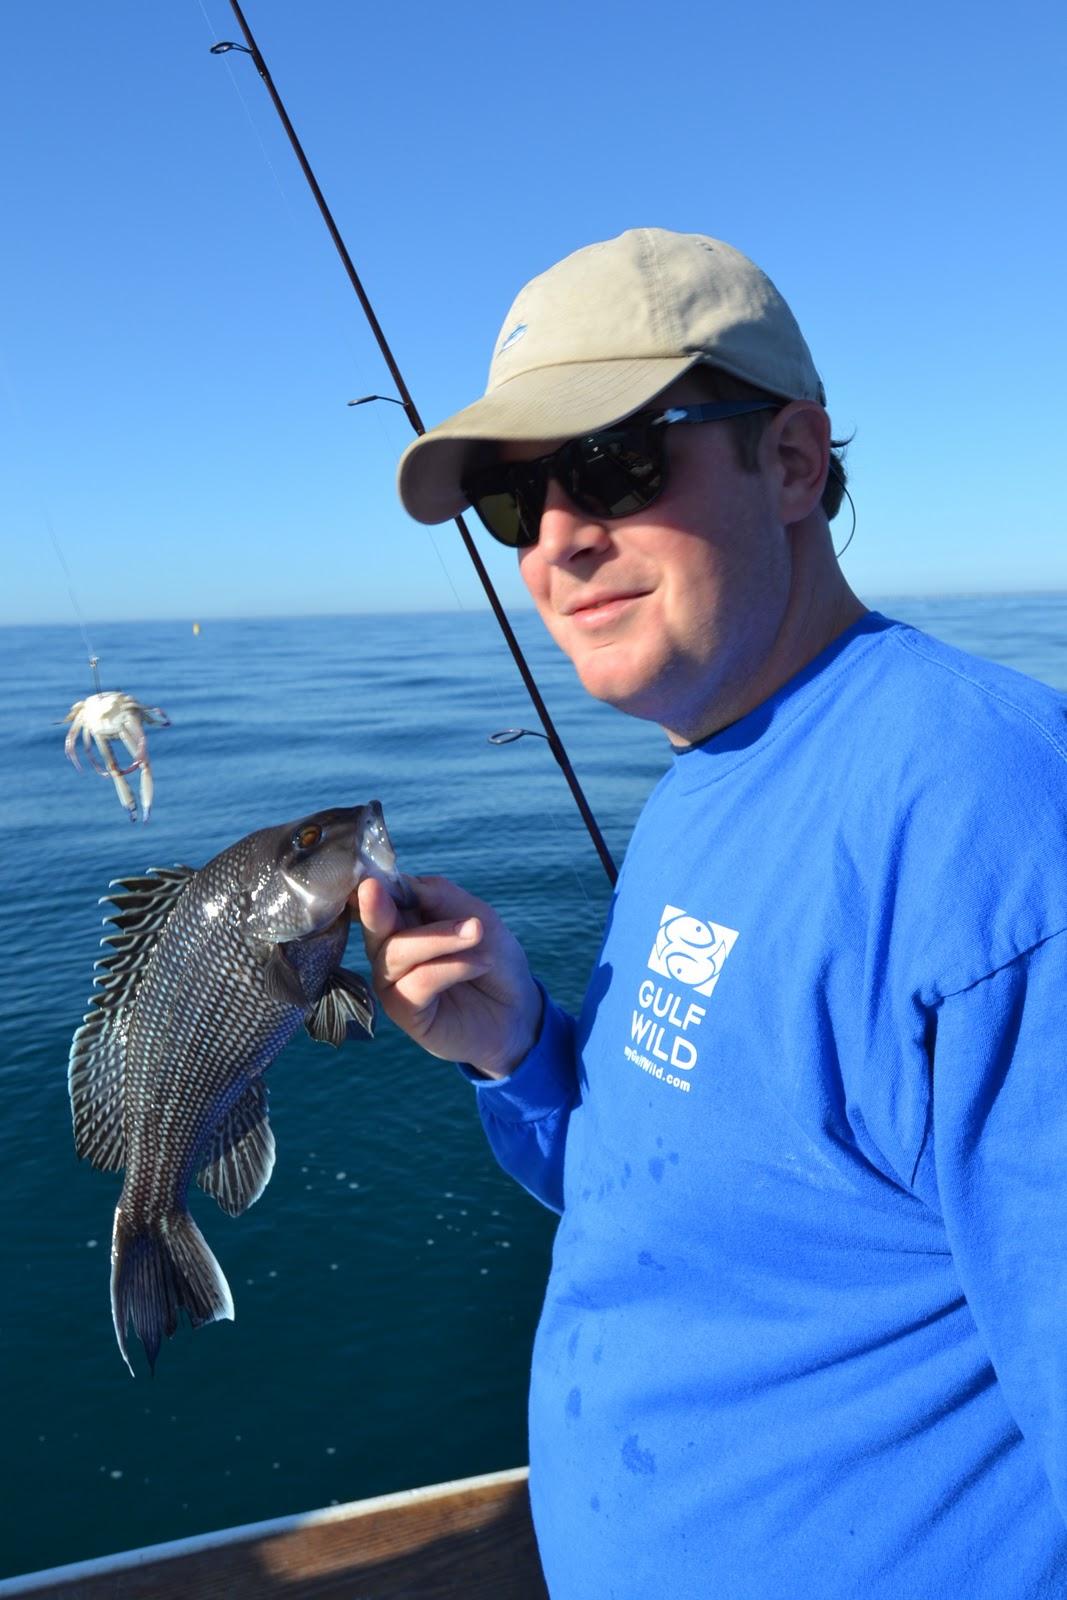 Murrells inlet sc fishing reports sheepshead december 2011 for Fishing charters murrells inlet sc